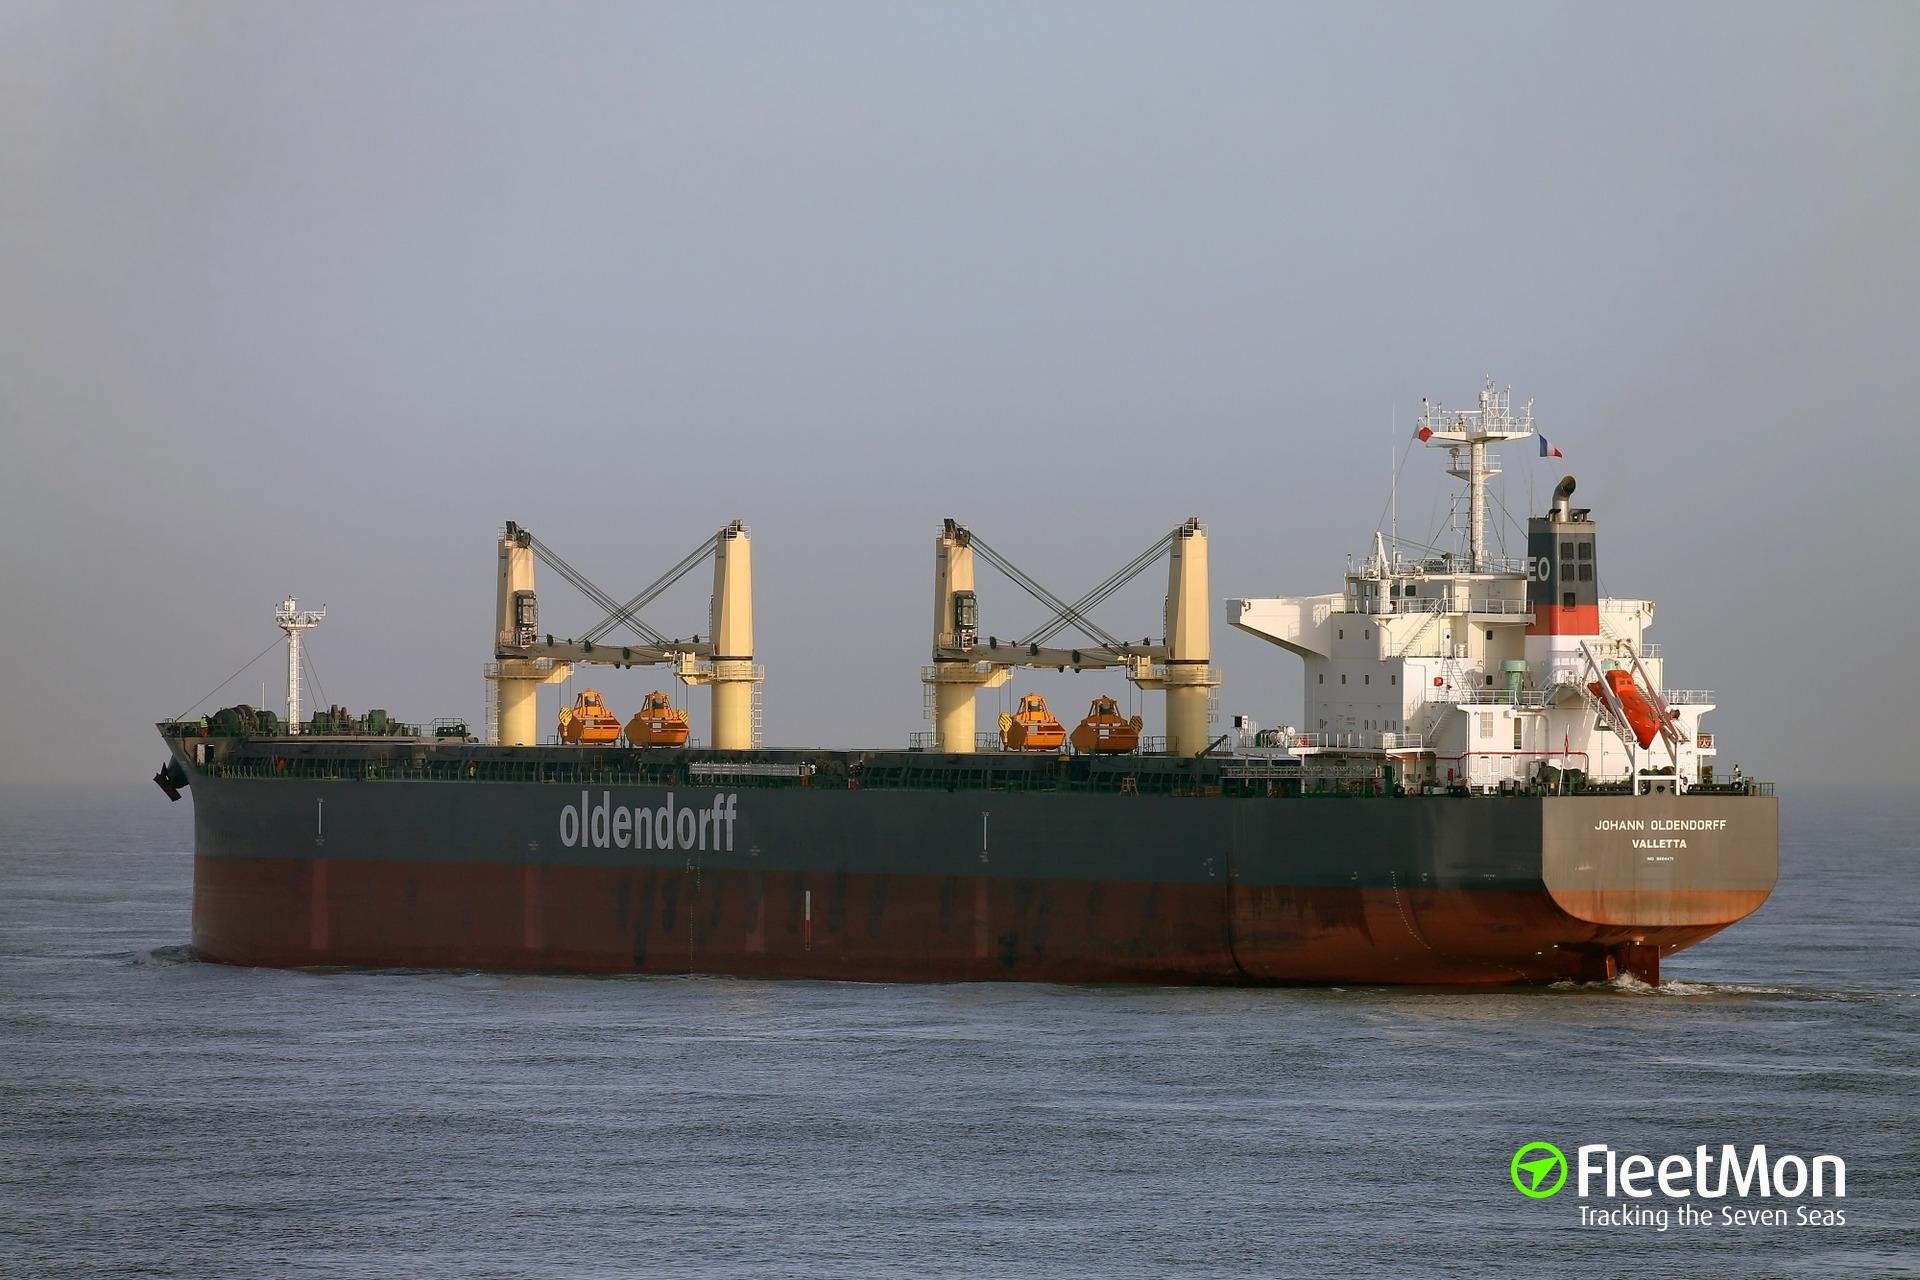 Bulk carrier JOHANN OLDENDORFF aground, Parana River